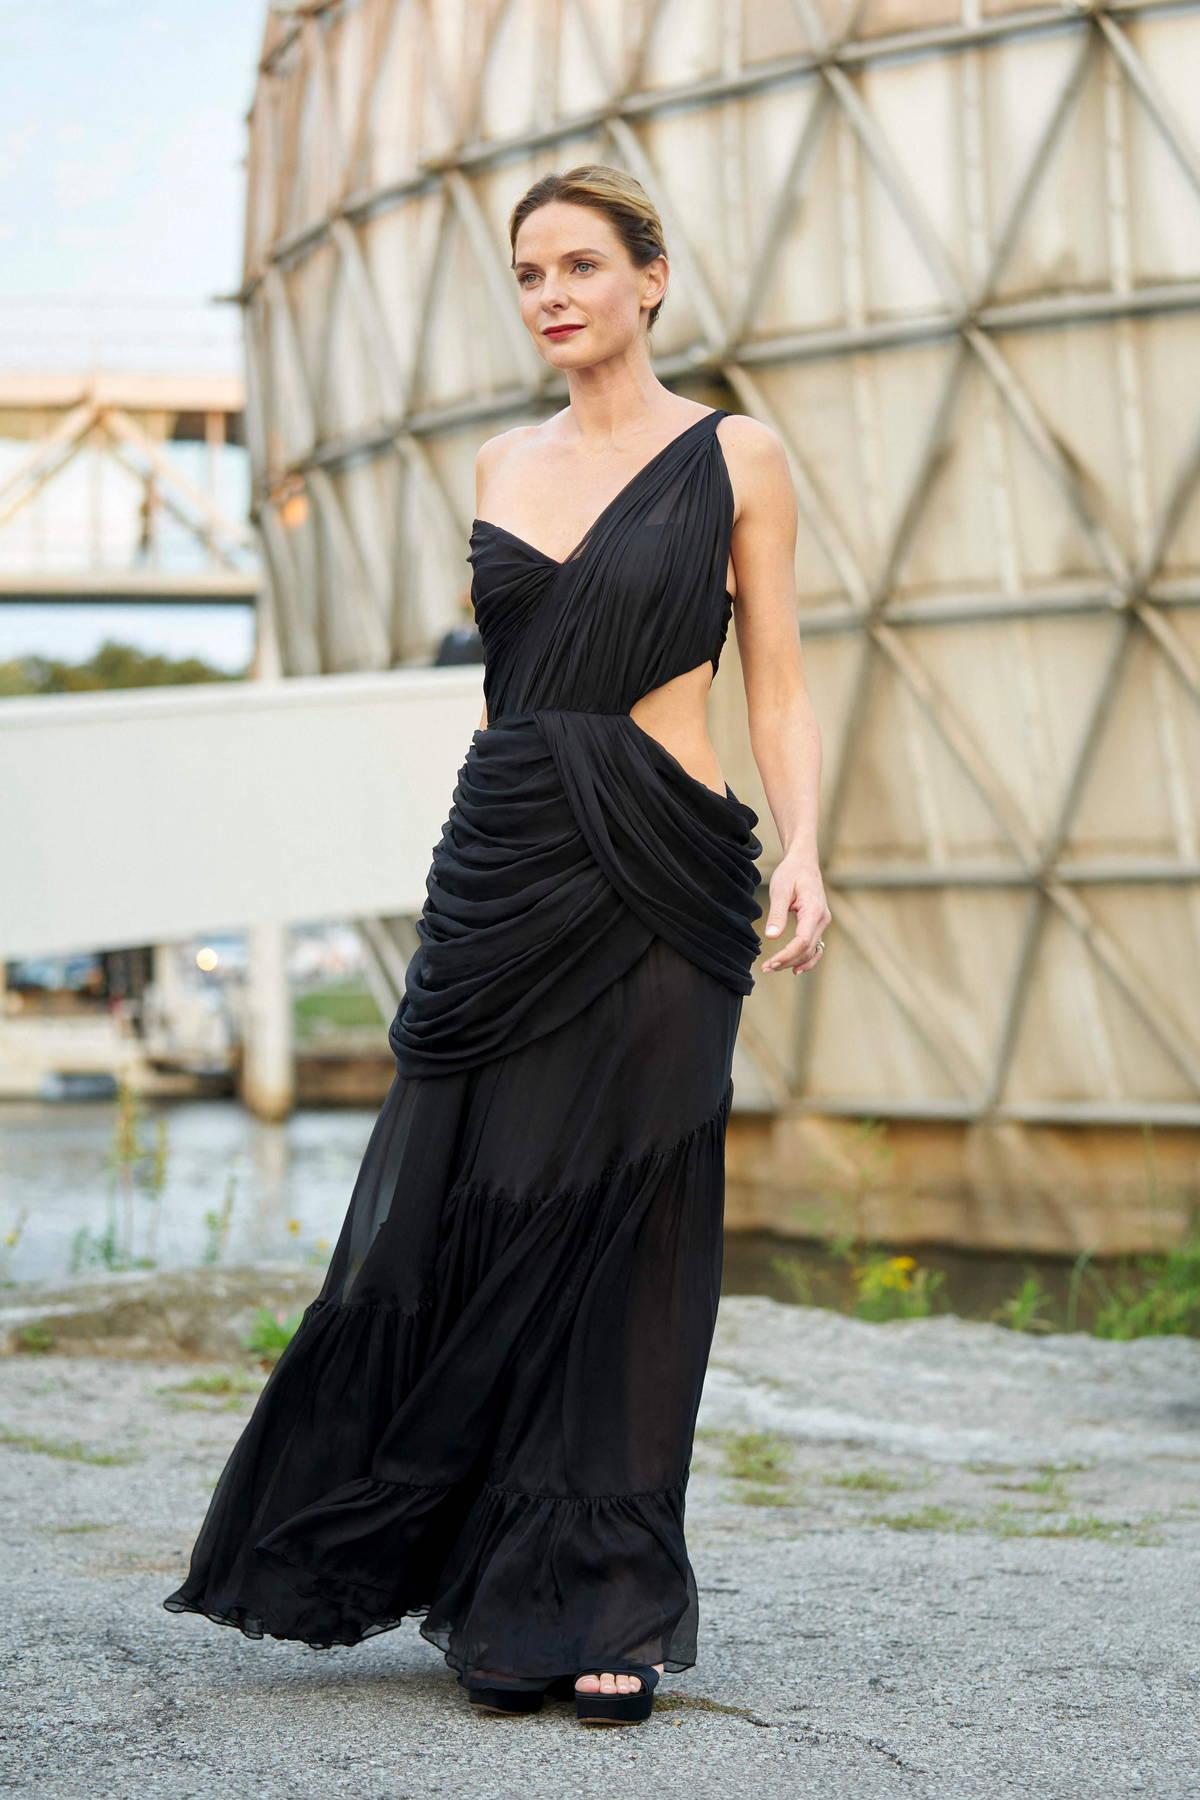 Rebecca Ferguson attends the Premiere of 'Dune' during the 2021 Toronto International Film Festival in Toronto, Canada